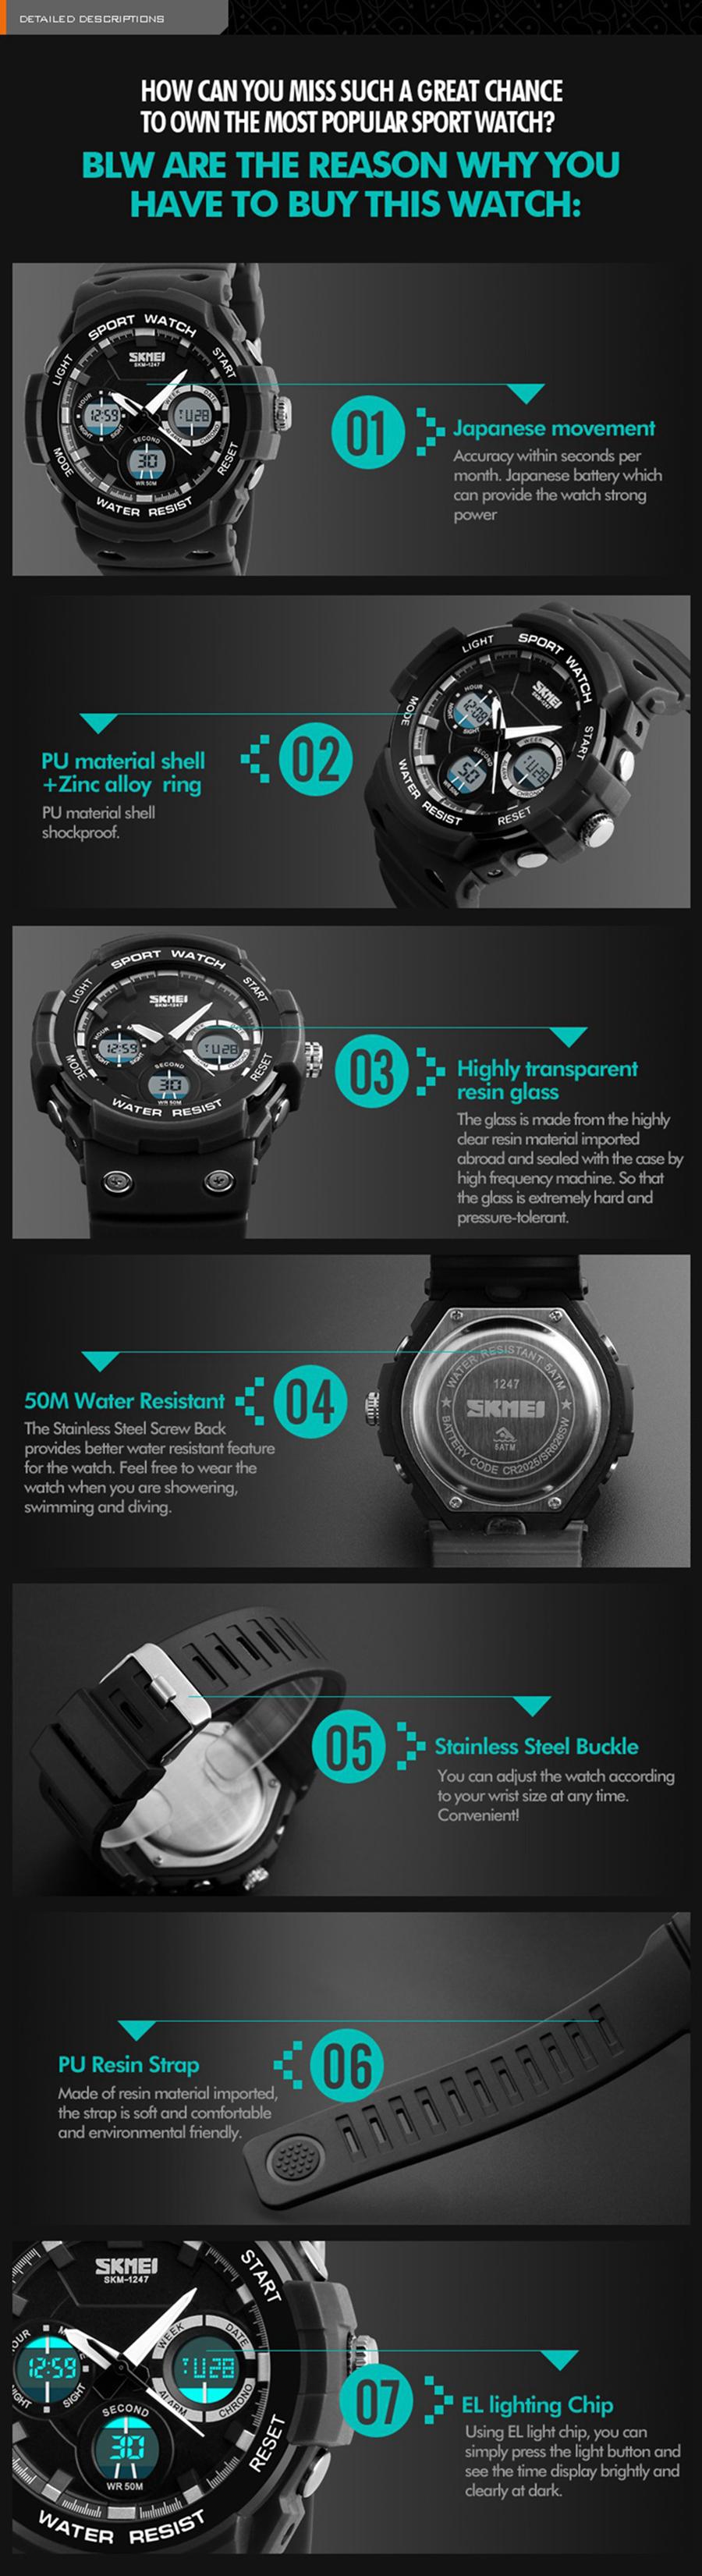 SKMEI 1247 Luminous Chronograph Dual Display Digital Watch